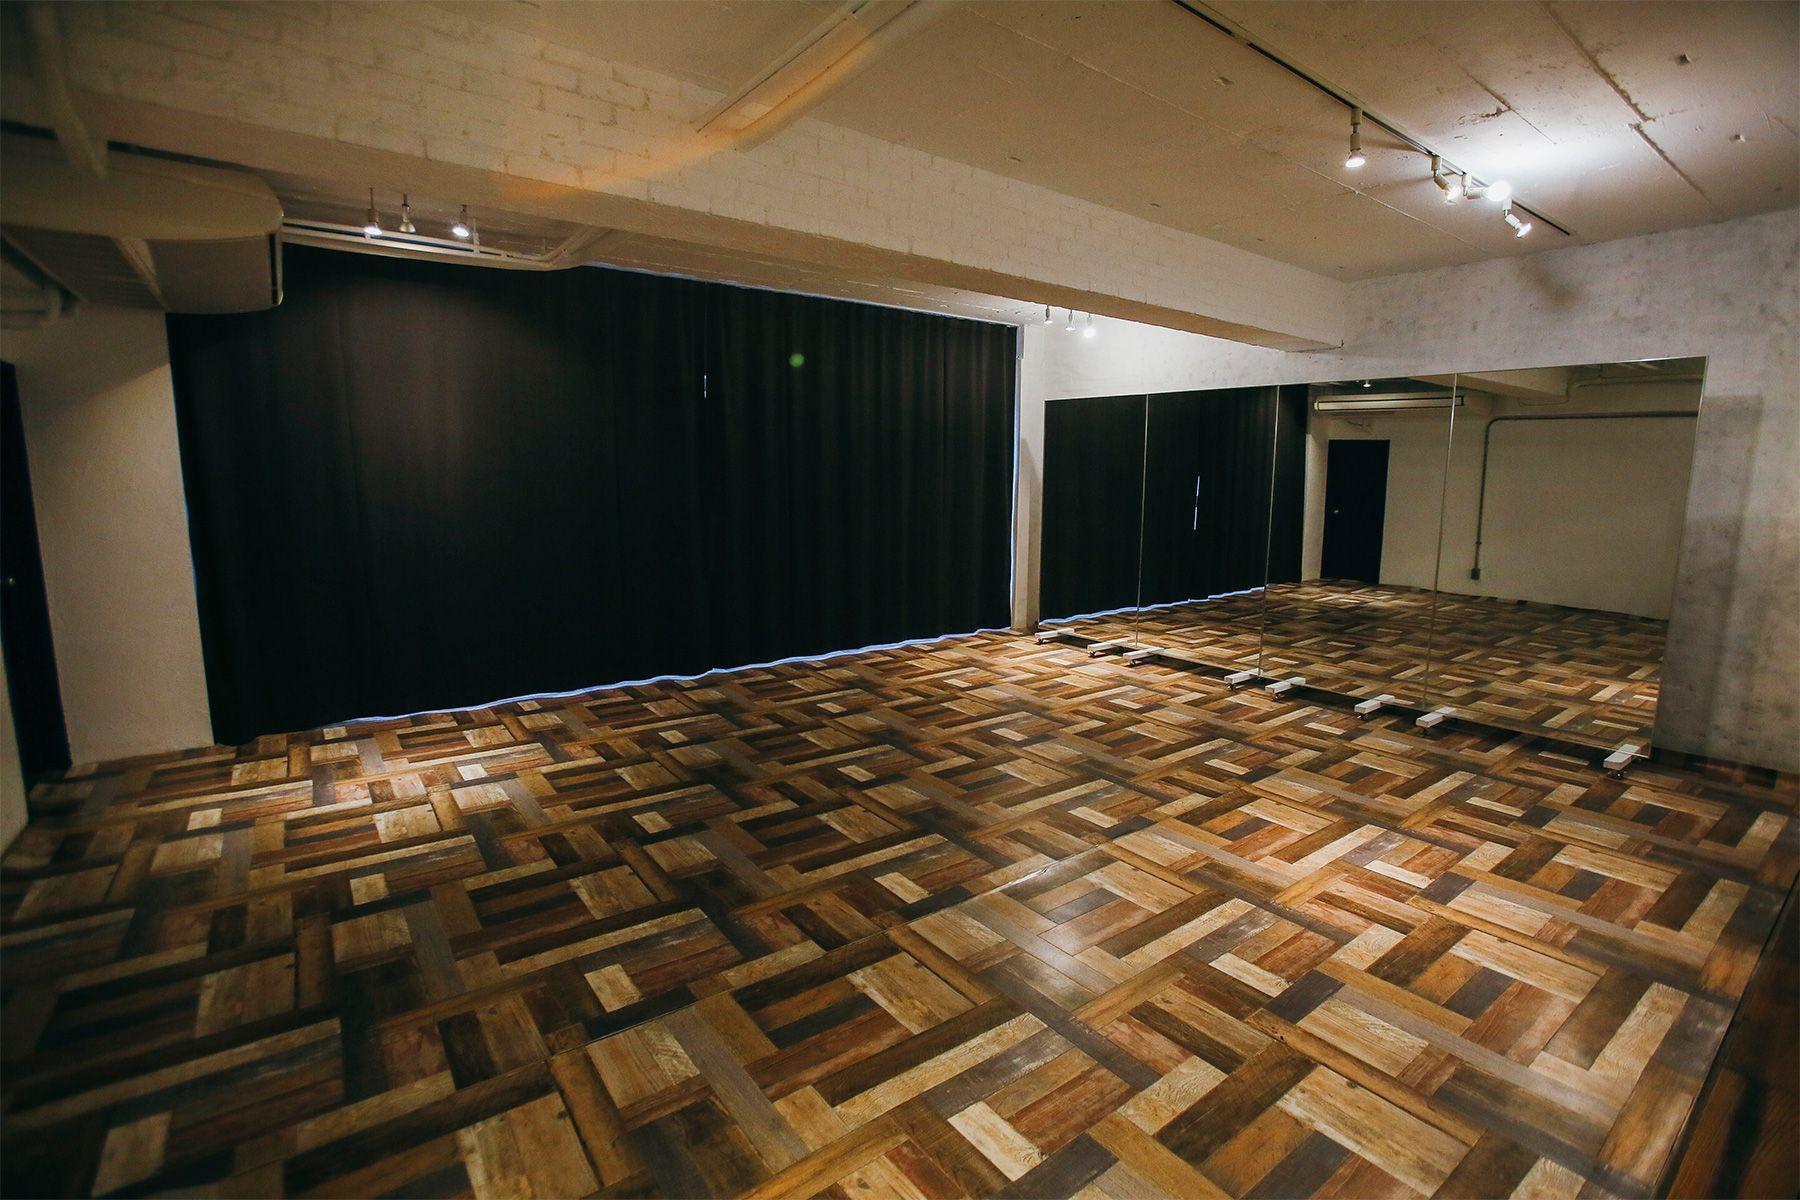 Studio 5th NAKAMEGURO (スタジオフィフス)ダンススタジオ仕様